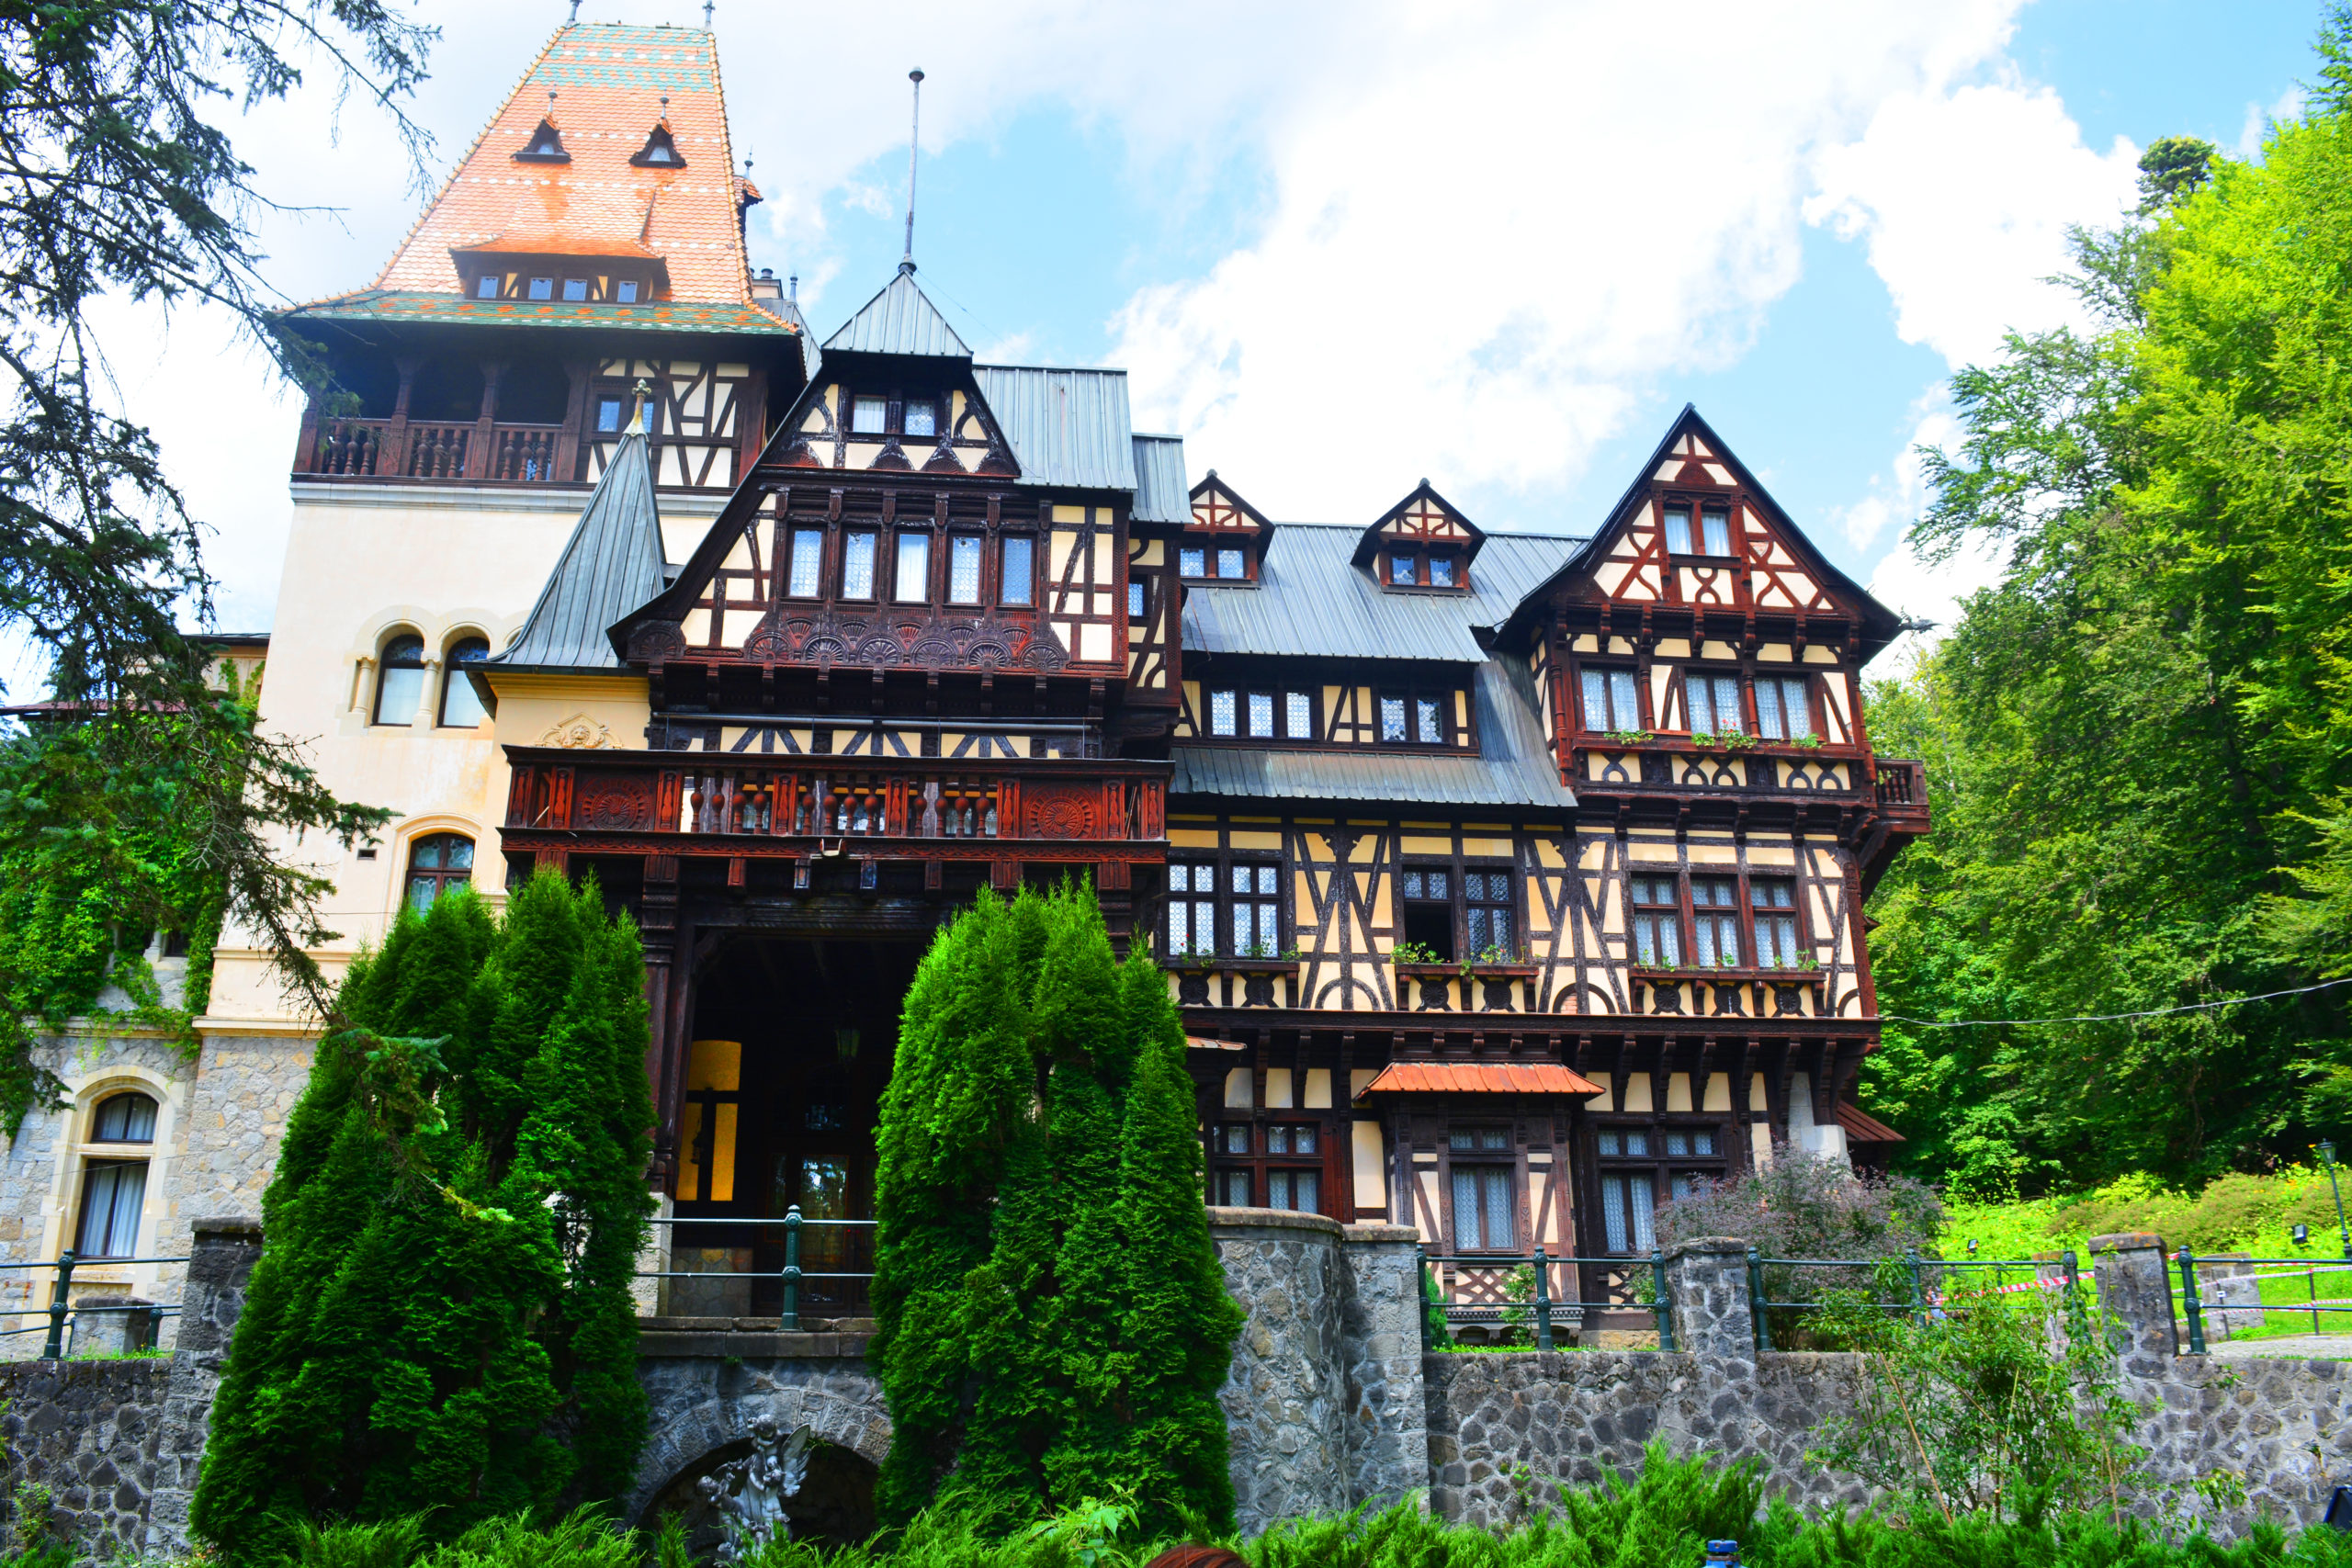 Pelisor – The castle that houses Queen Maria's Heart